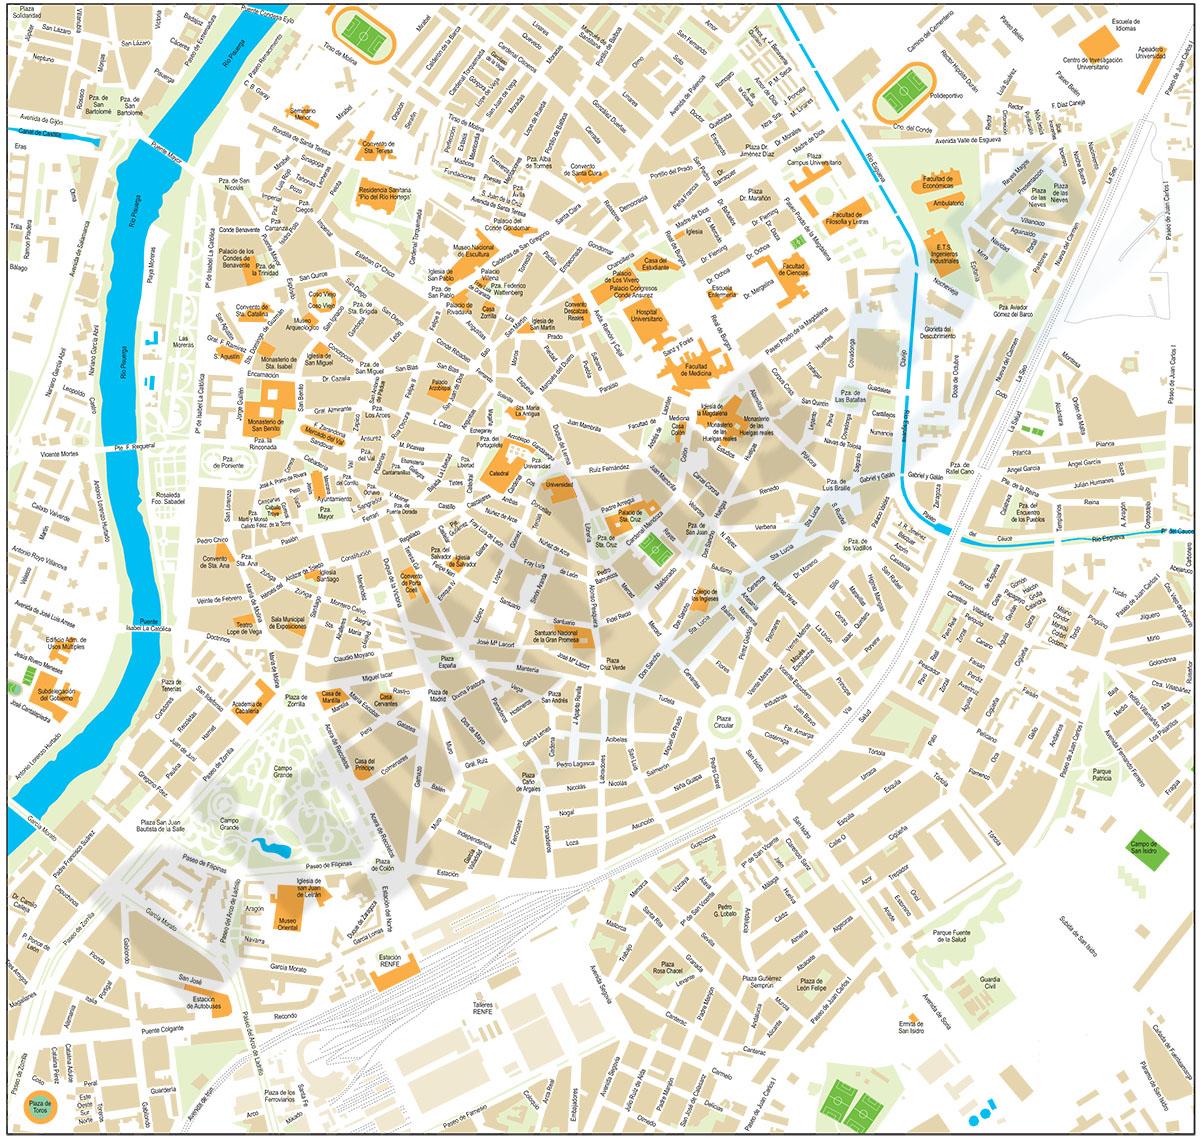 Valladolid center city map